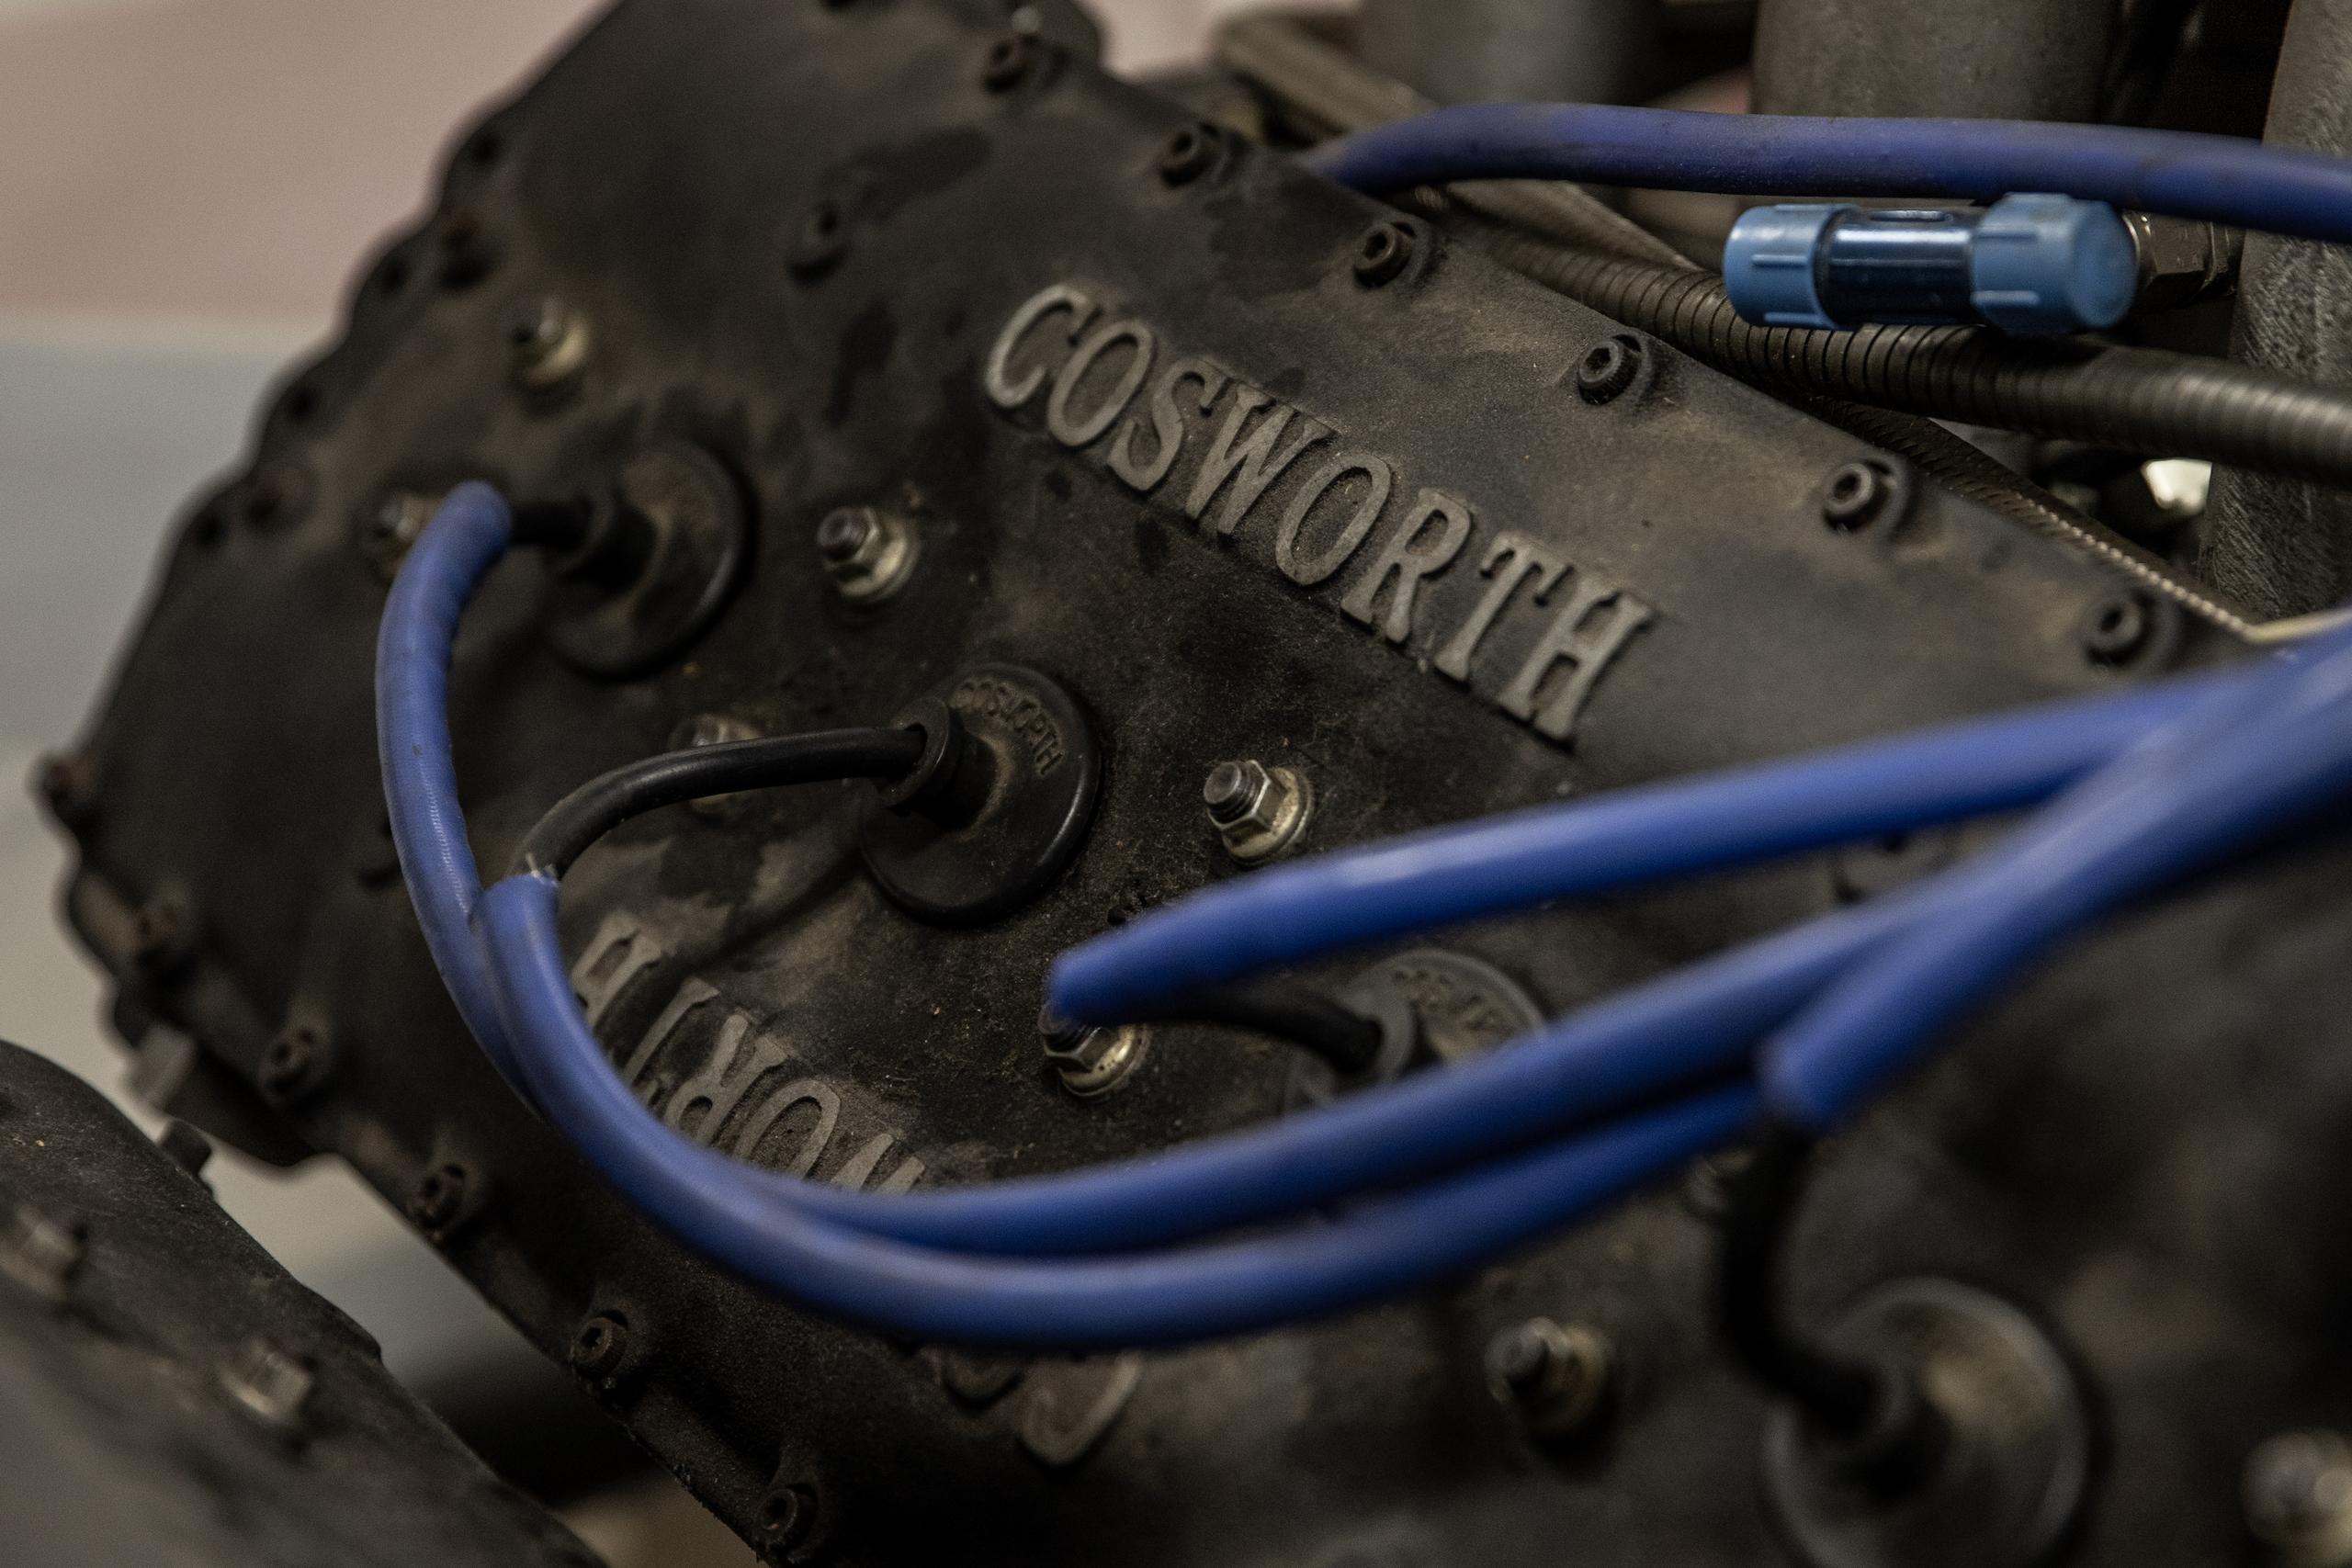 Turn 4 Restorations engine cosworth